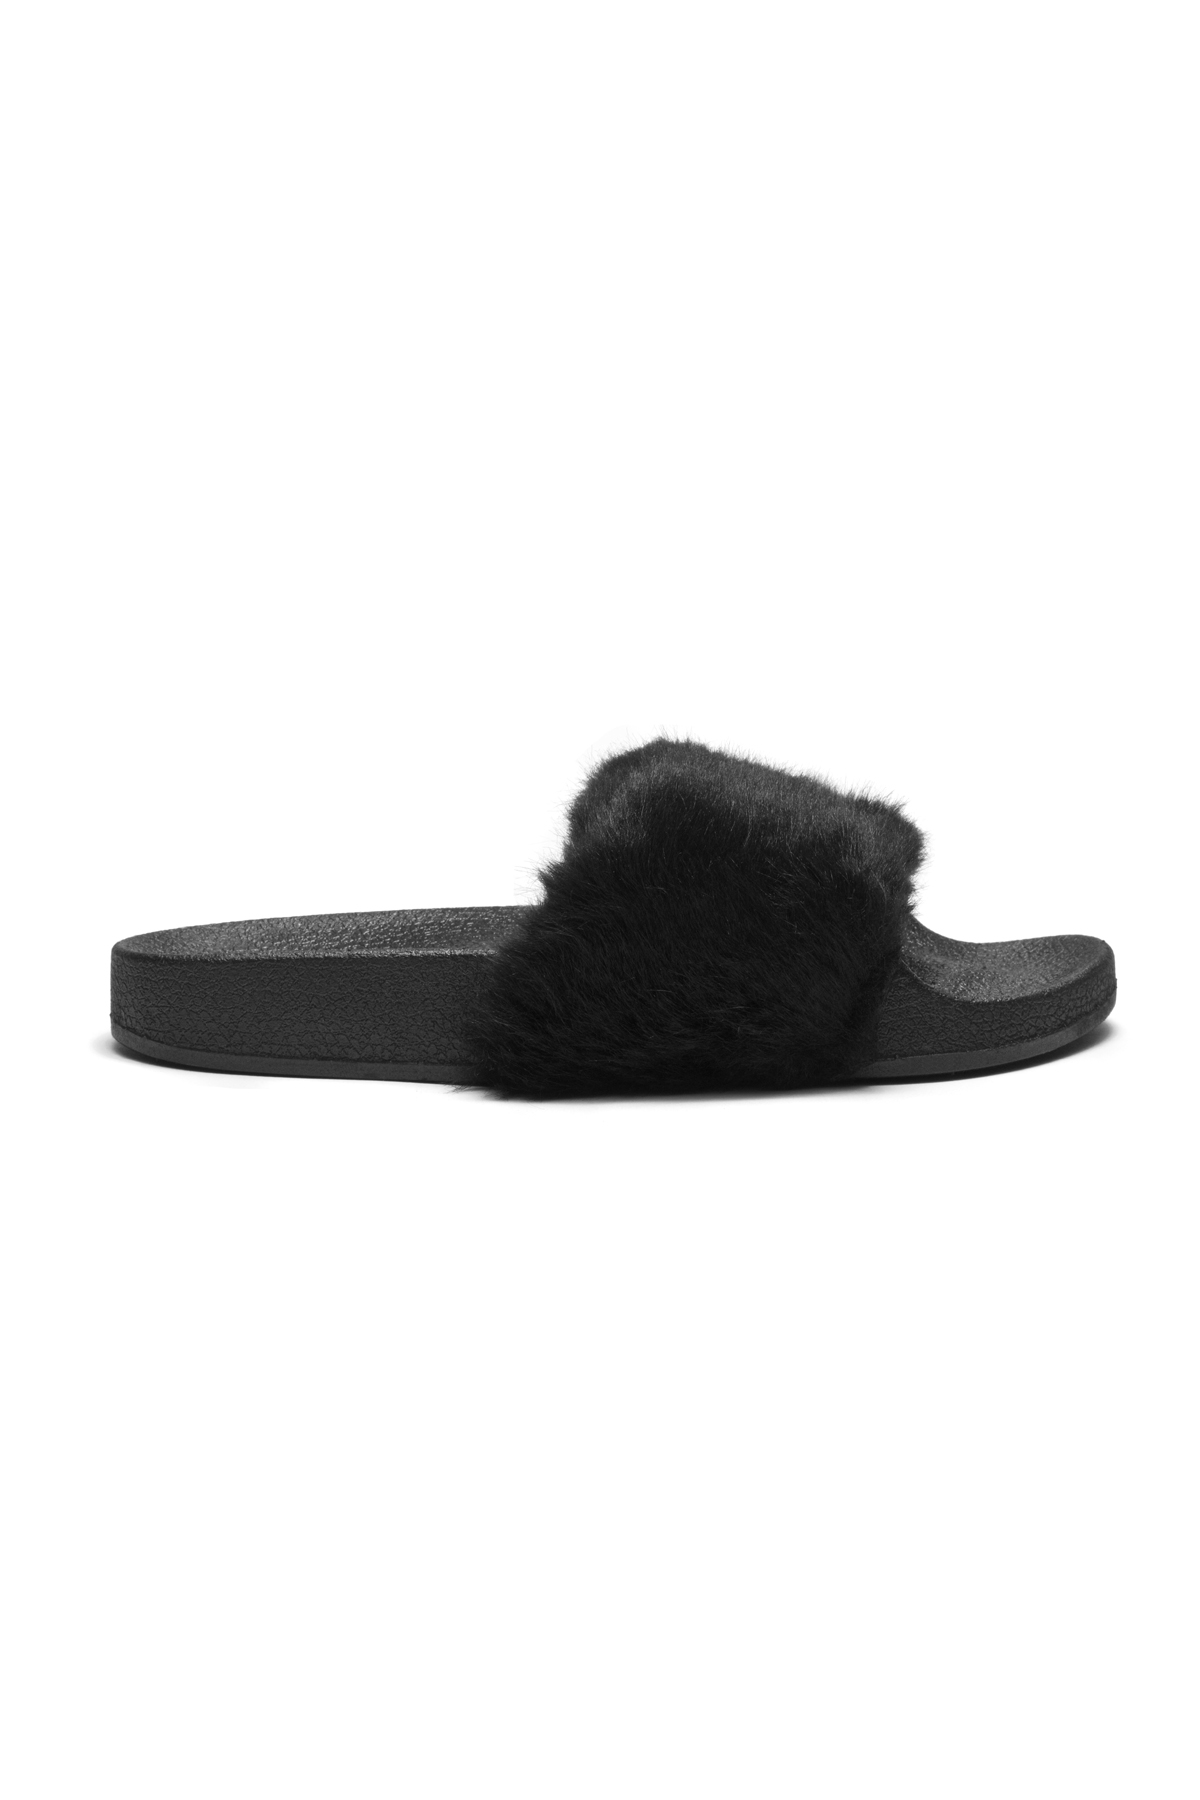 44adc4f89cdd Herstyle Women s SL-160801 Faux Fur Slide Sandal(Black)